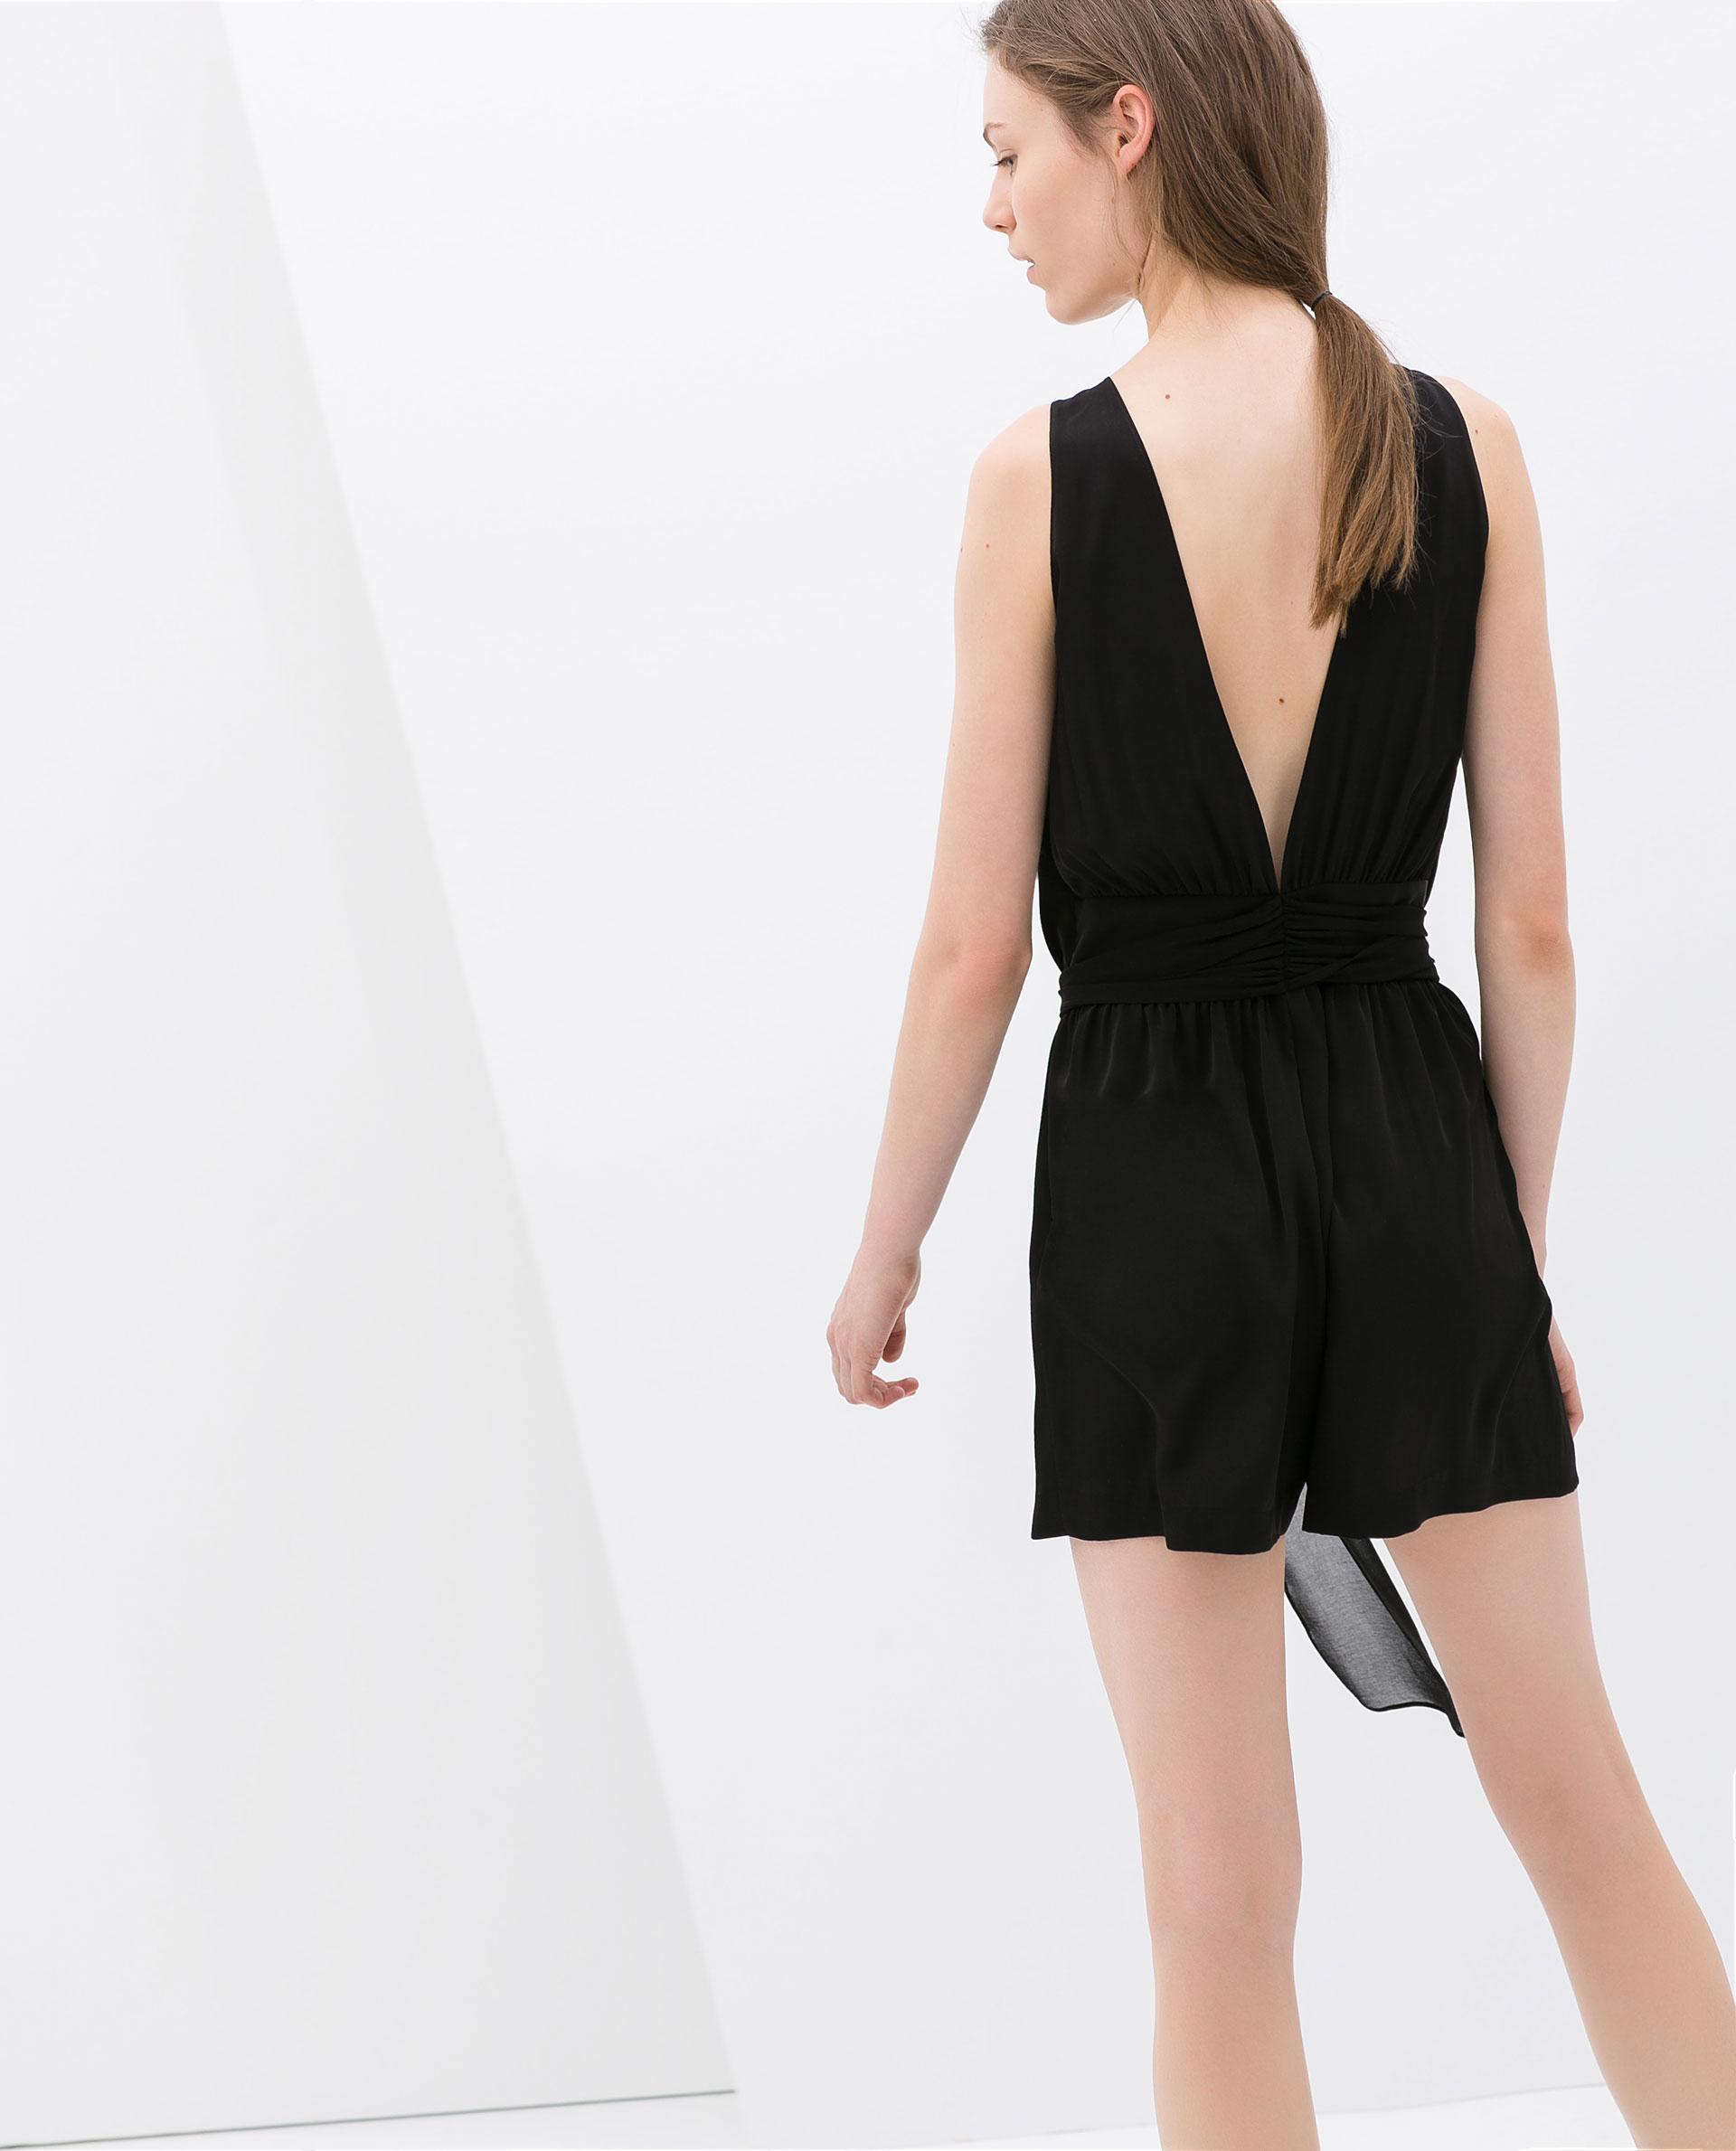 Zara backless dress black